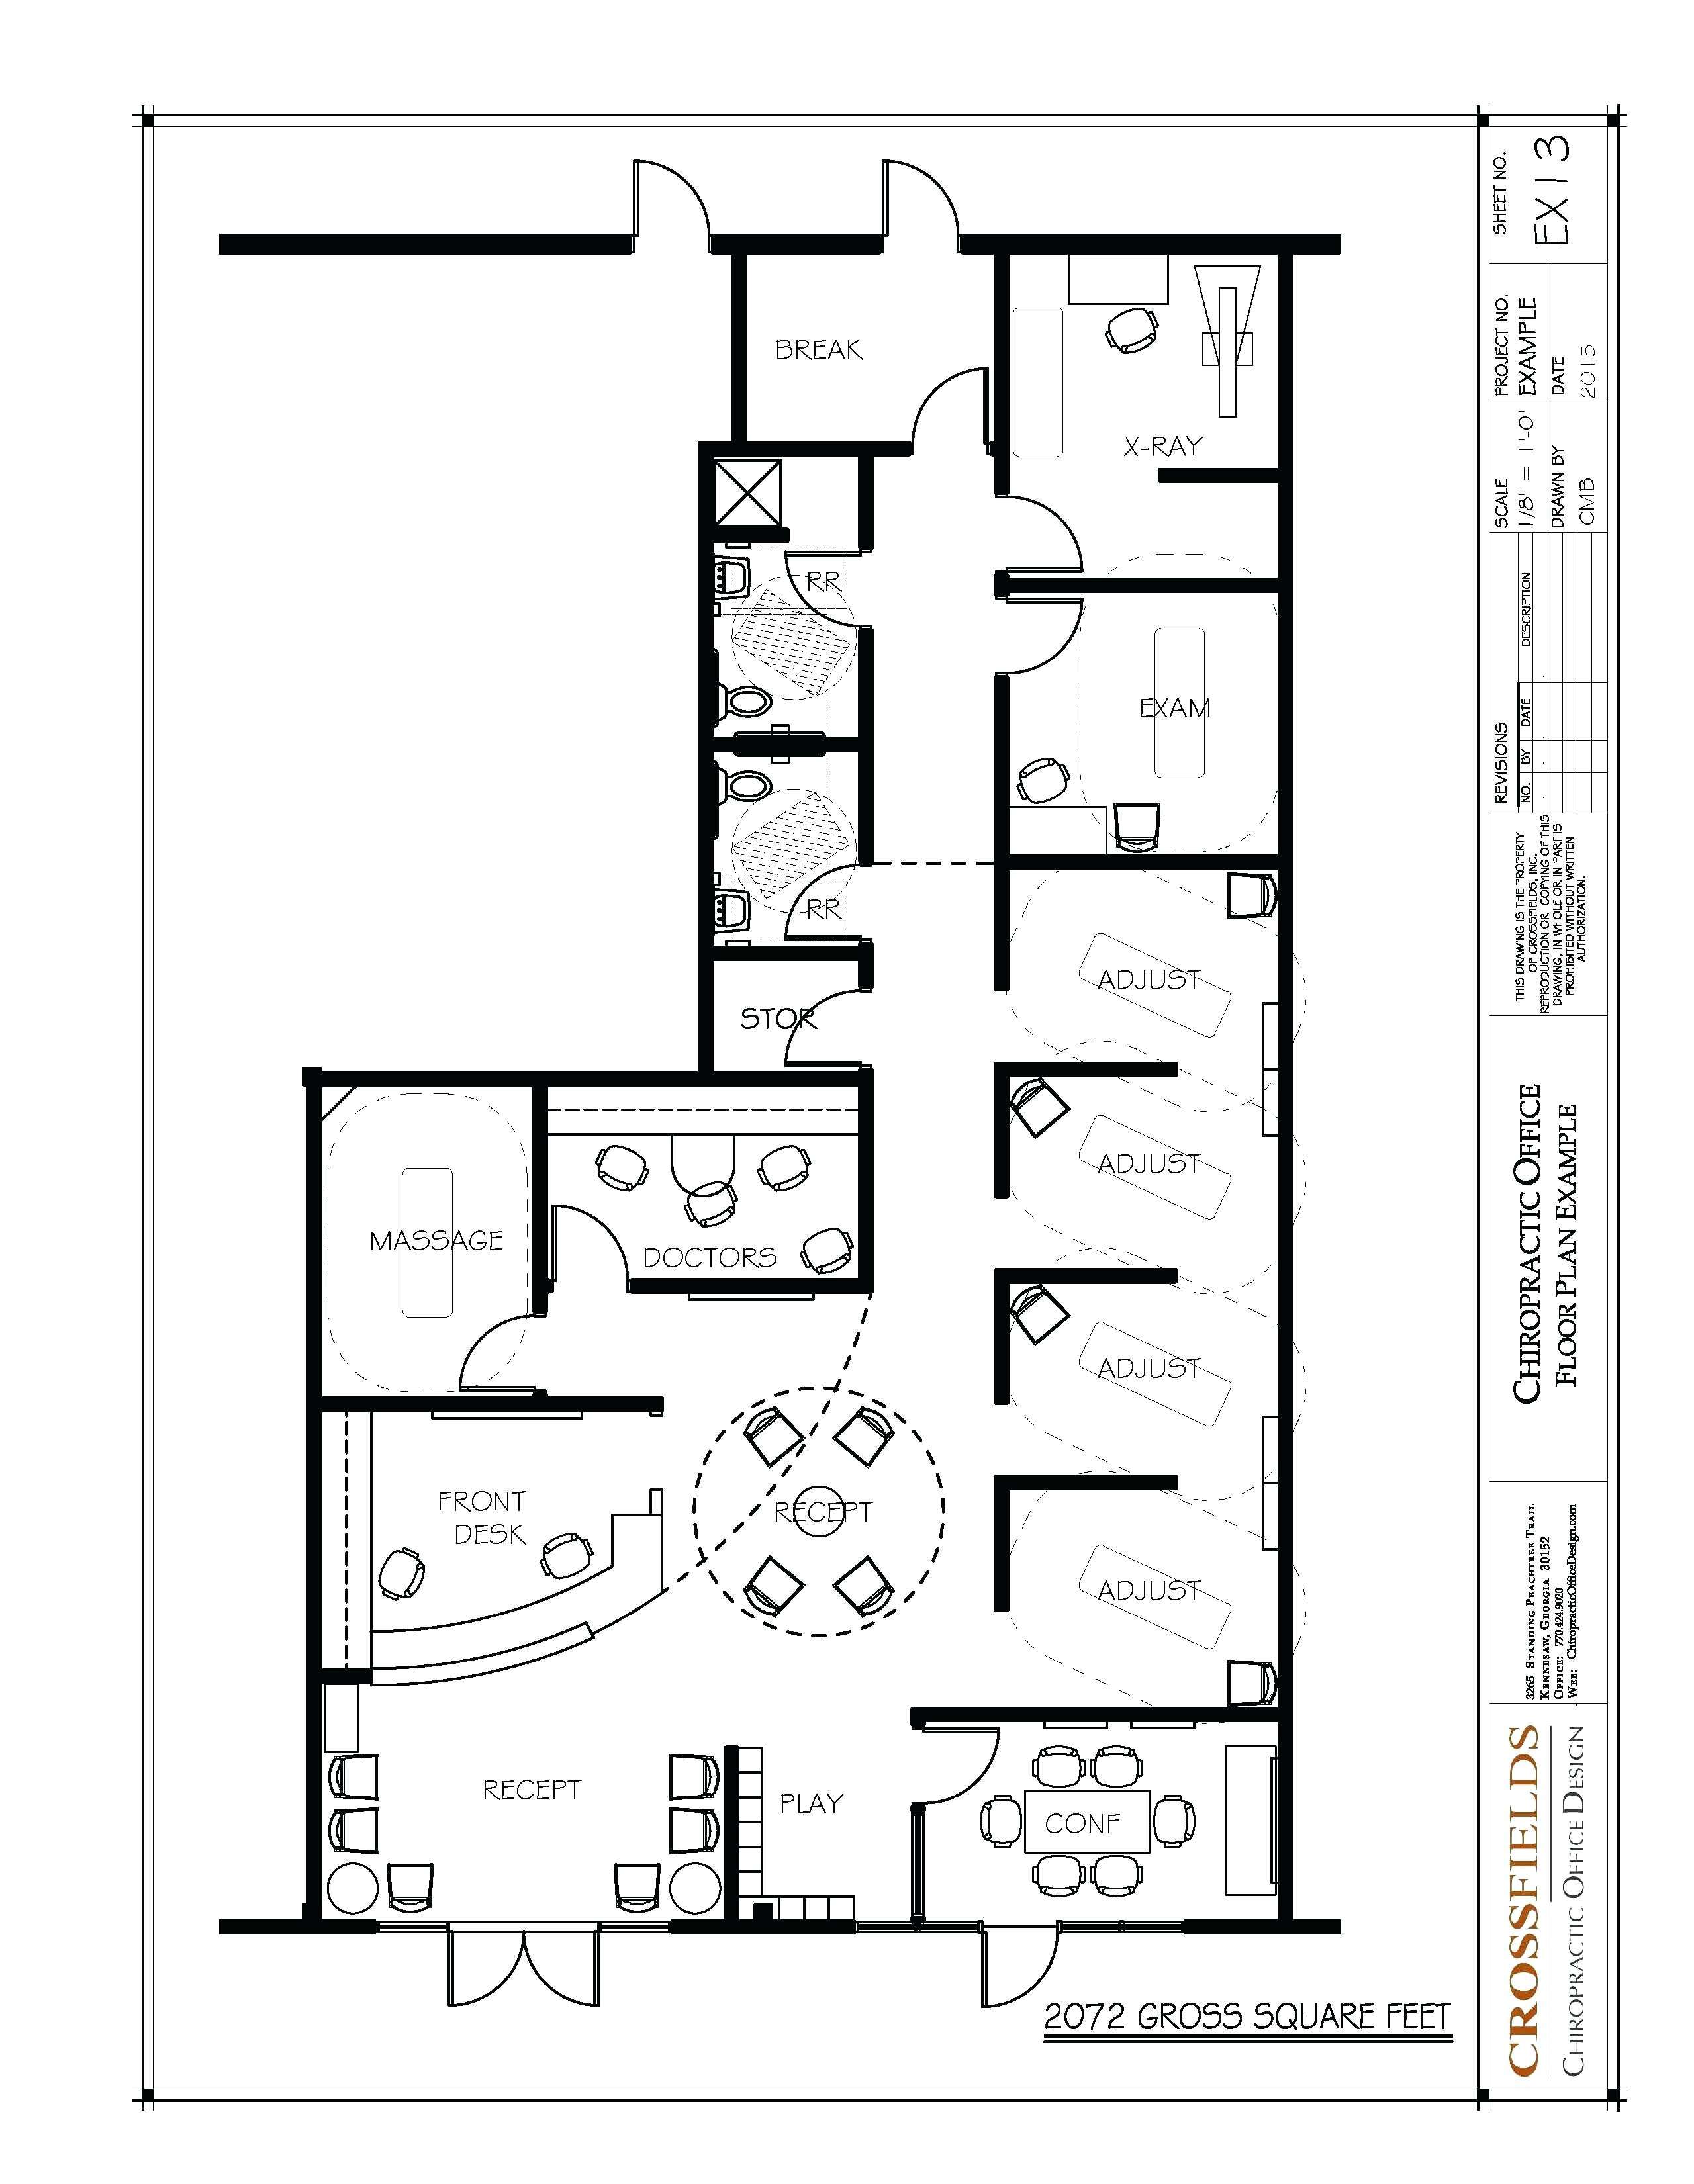 Drawn office modern Plan Full  Chiropractic Small